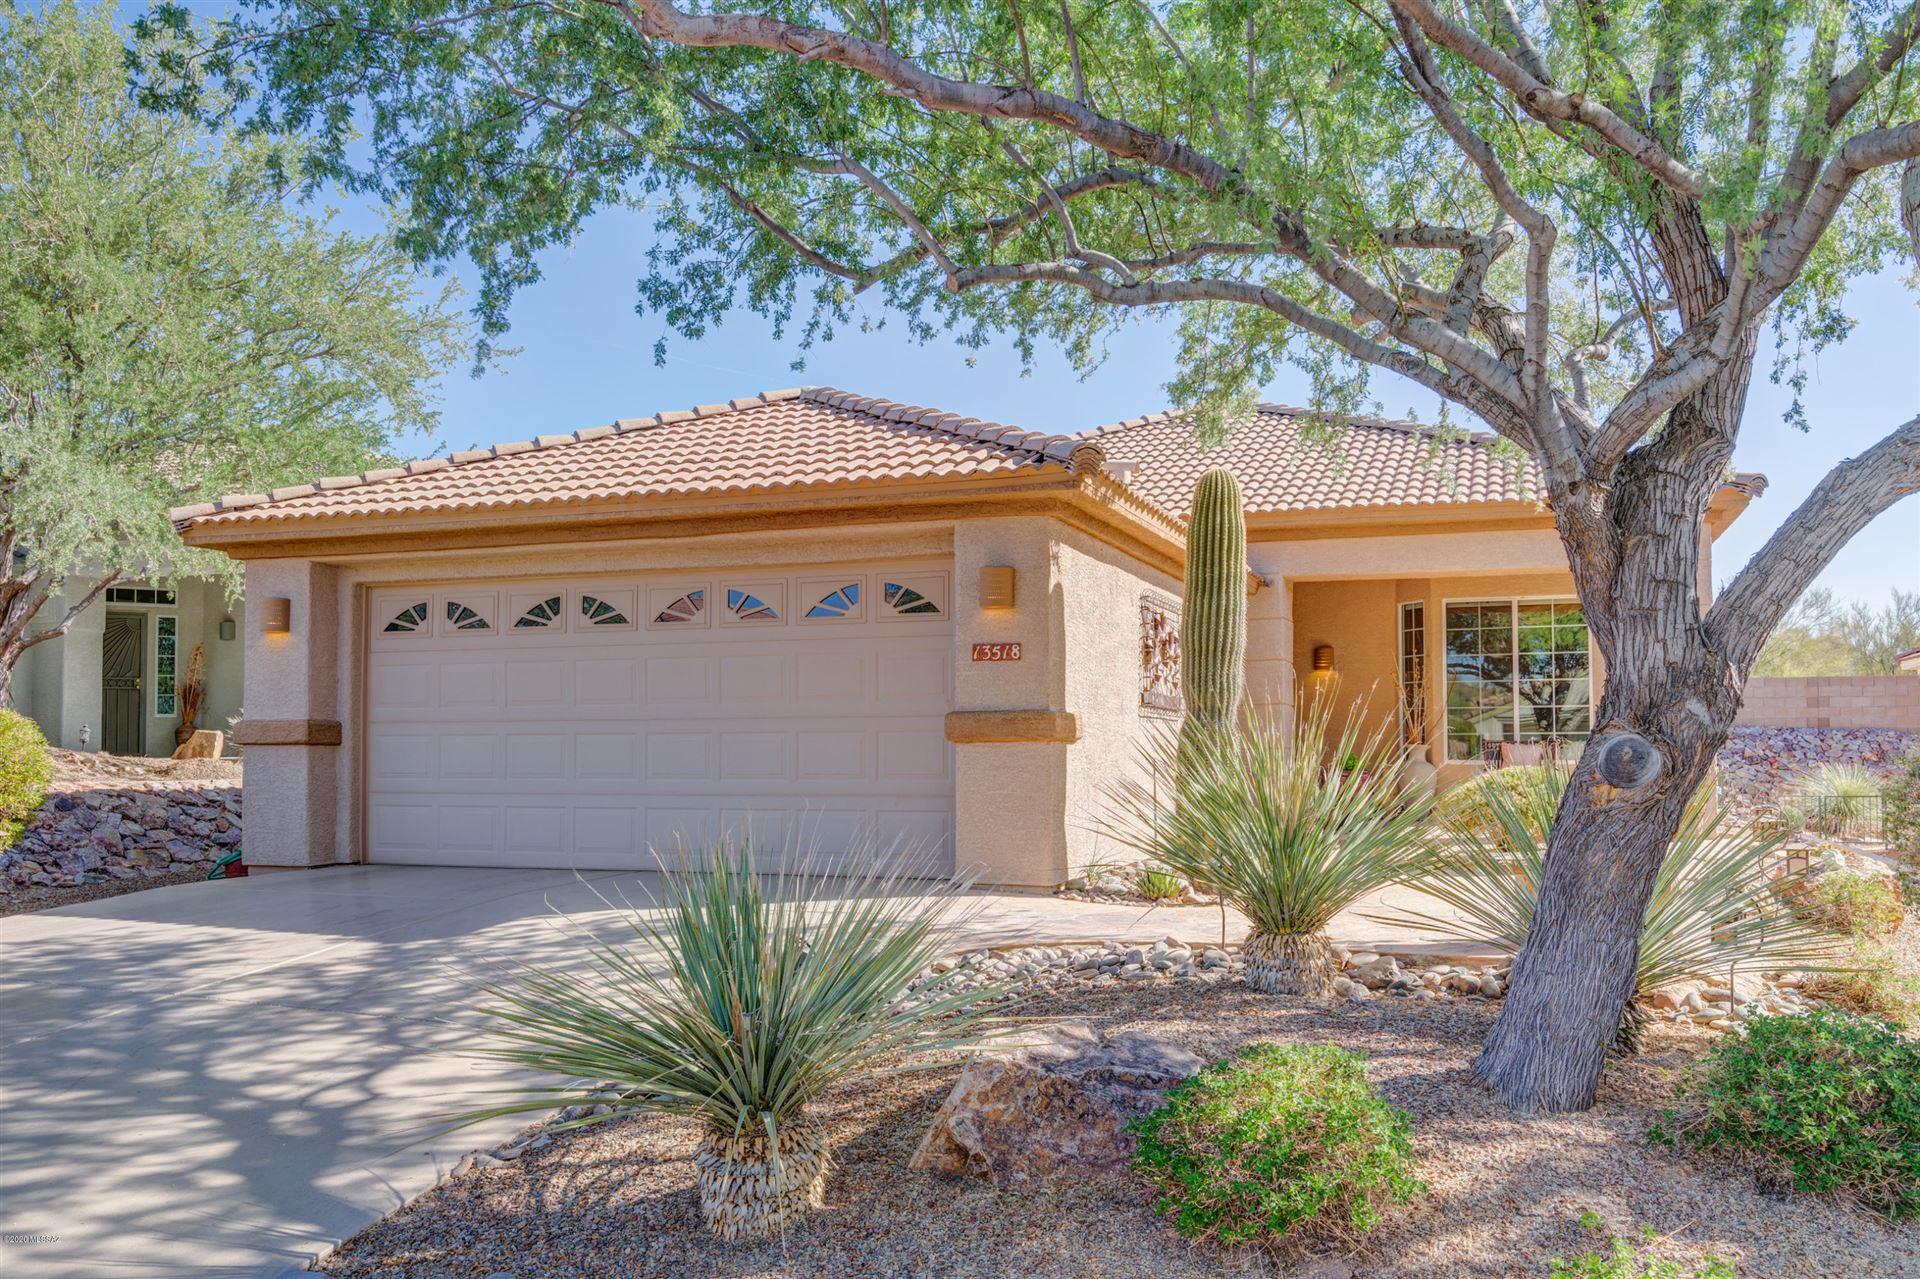 13518 N Holly Grape Drive, Marana, AZ 85658 - #: 22026251